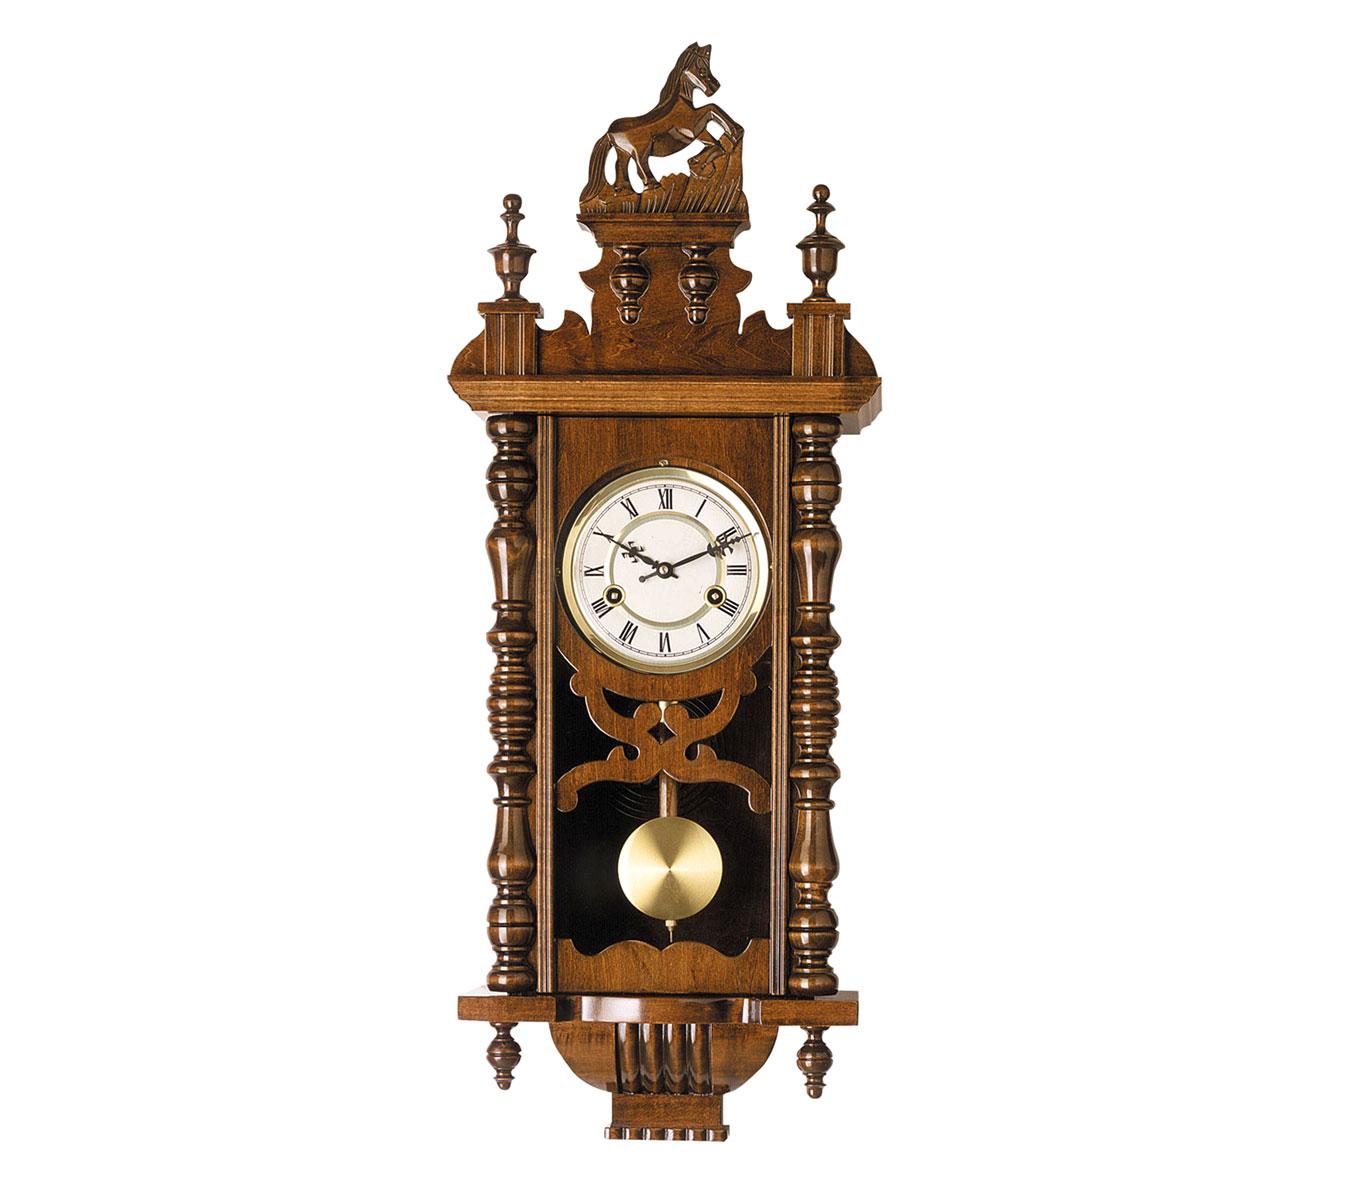 Reloj de pendulo de pared con carrillon cuarzo 77cm alta for Relojes de pared antiguos de pendulo